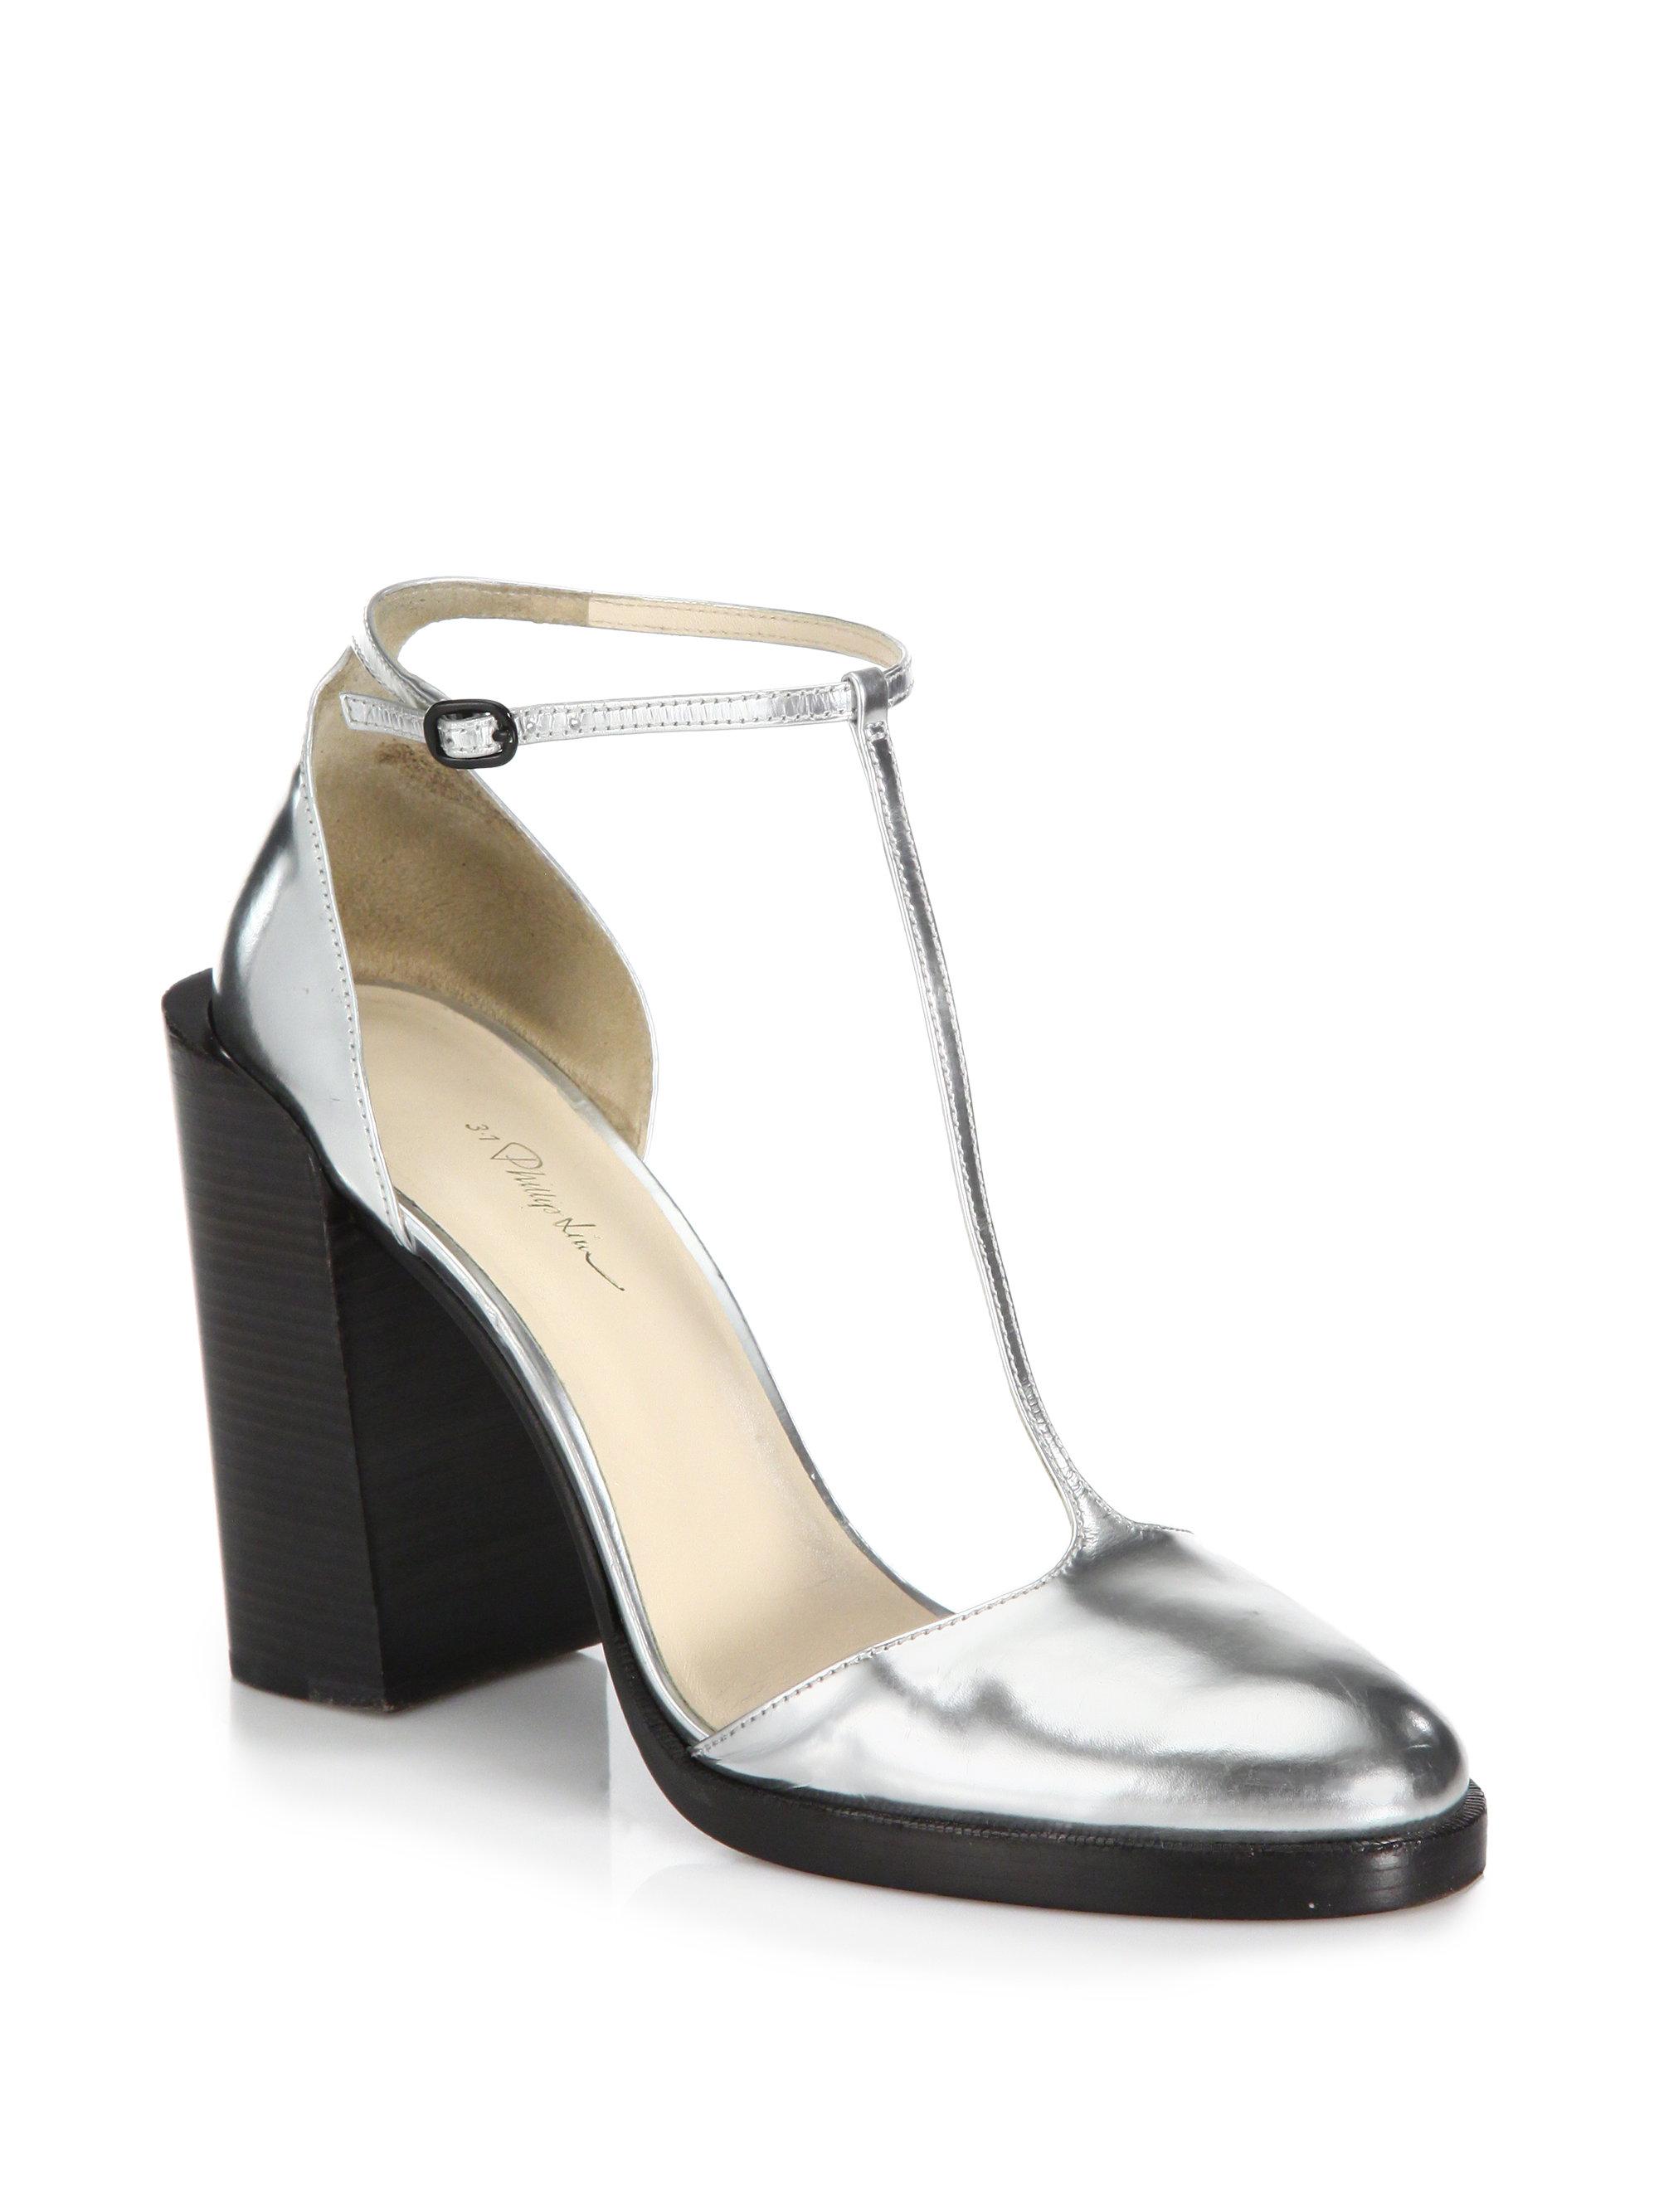 3 1 phillip lim augustine metallic leather t strap pumps in silver lyst. Black Bedroom Furniture Sets. Home Design Ideas